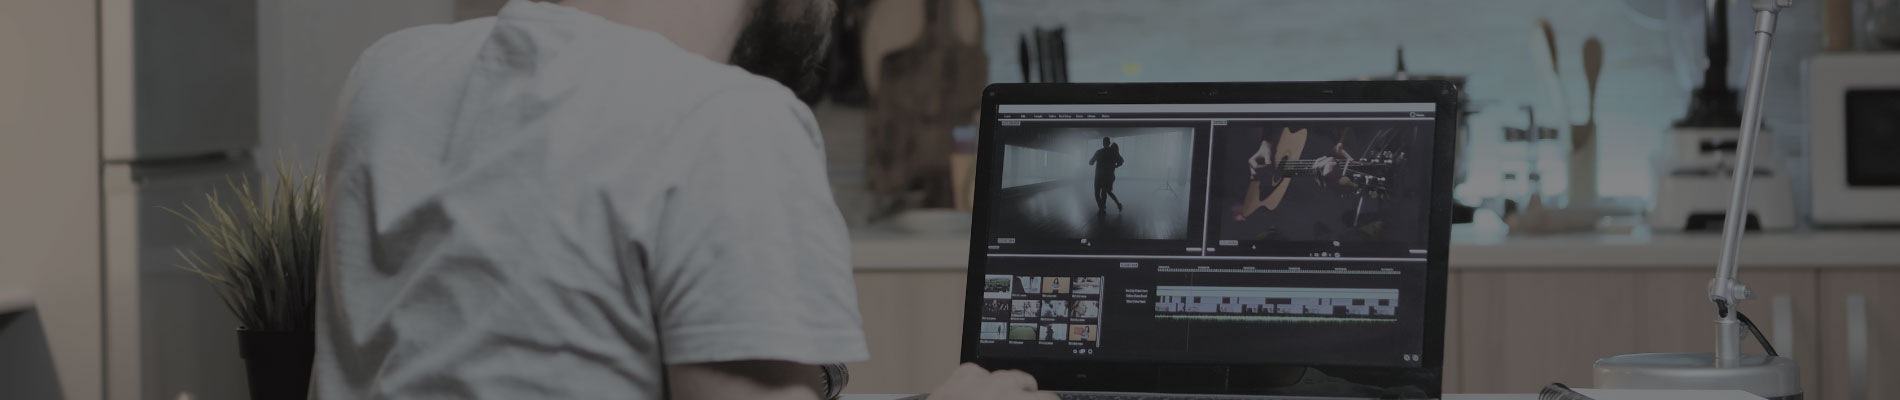 Light |Online Σεμινάριο  Premiere Pro CC 2018